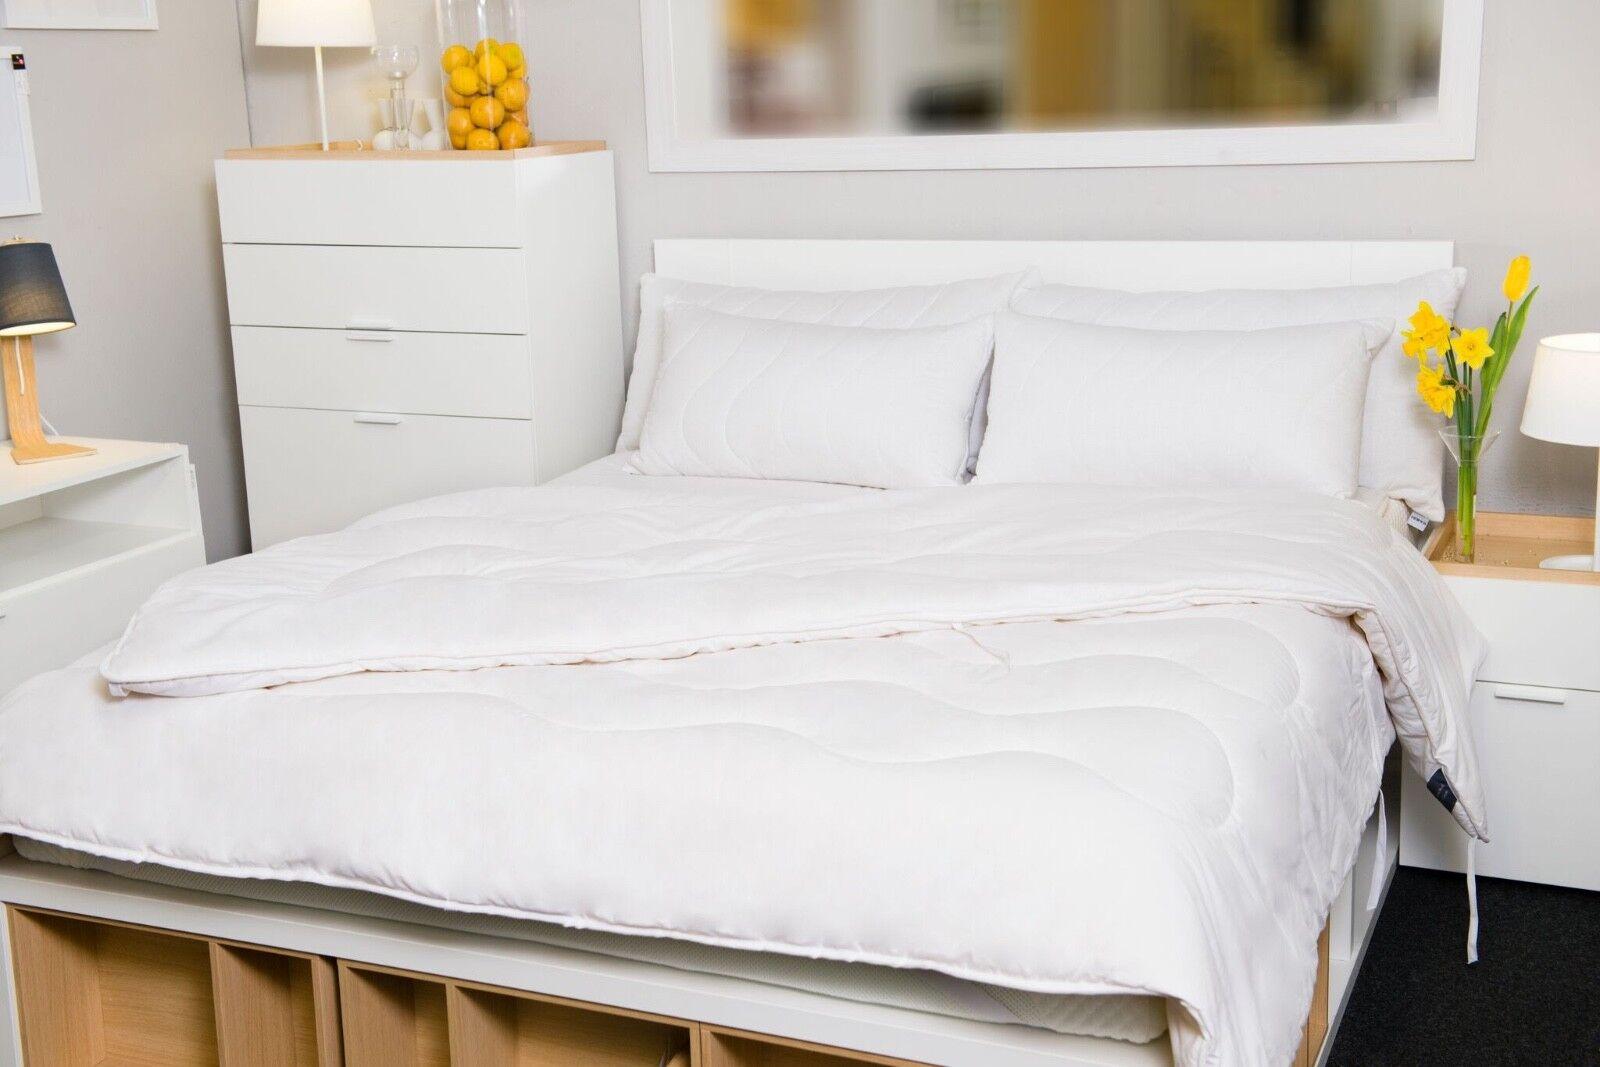 Merino Wool Cotton Duvet Quilt Single Double King Größe 100% NATURAL 10.5 tog